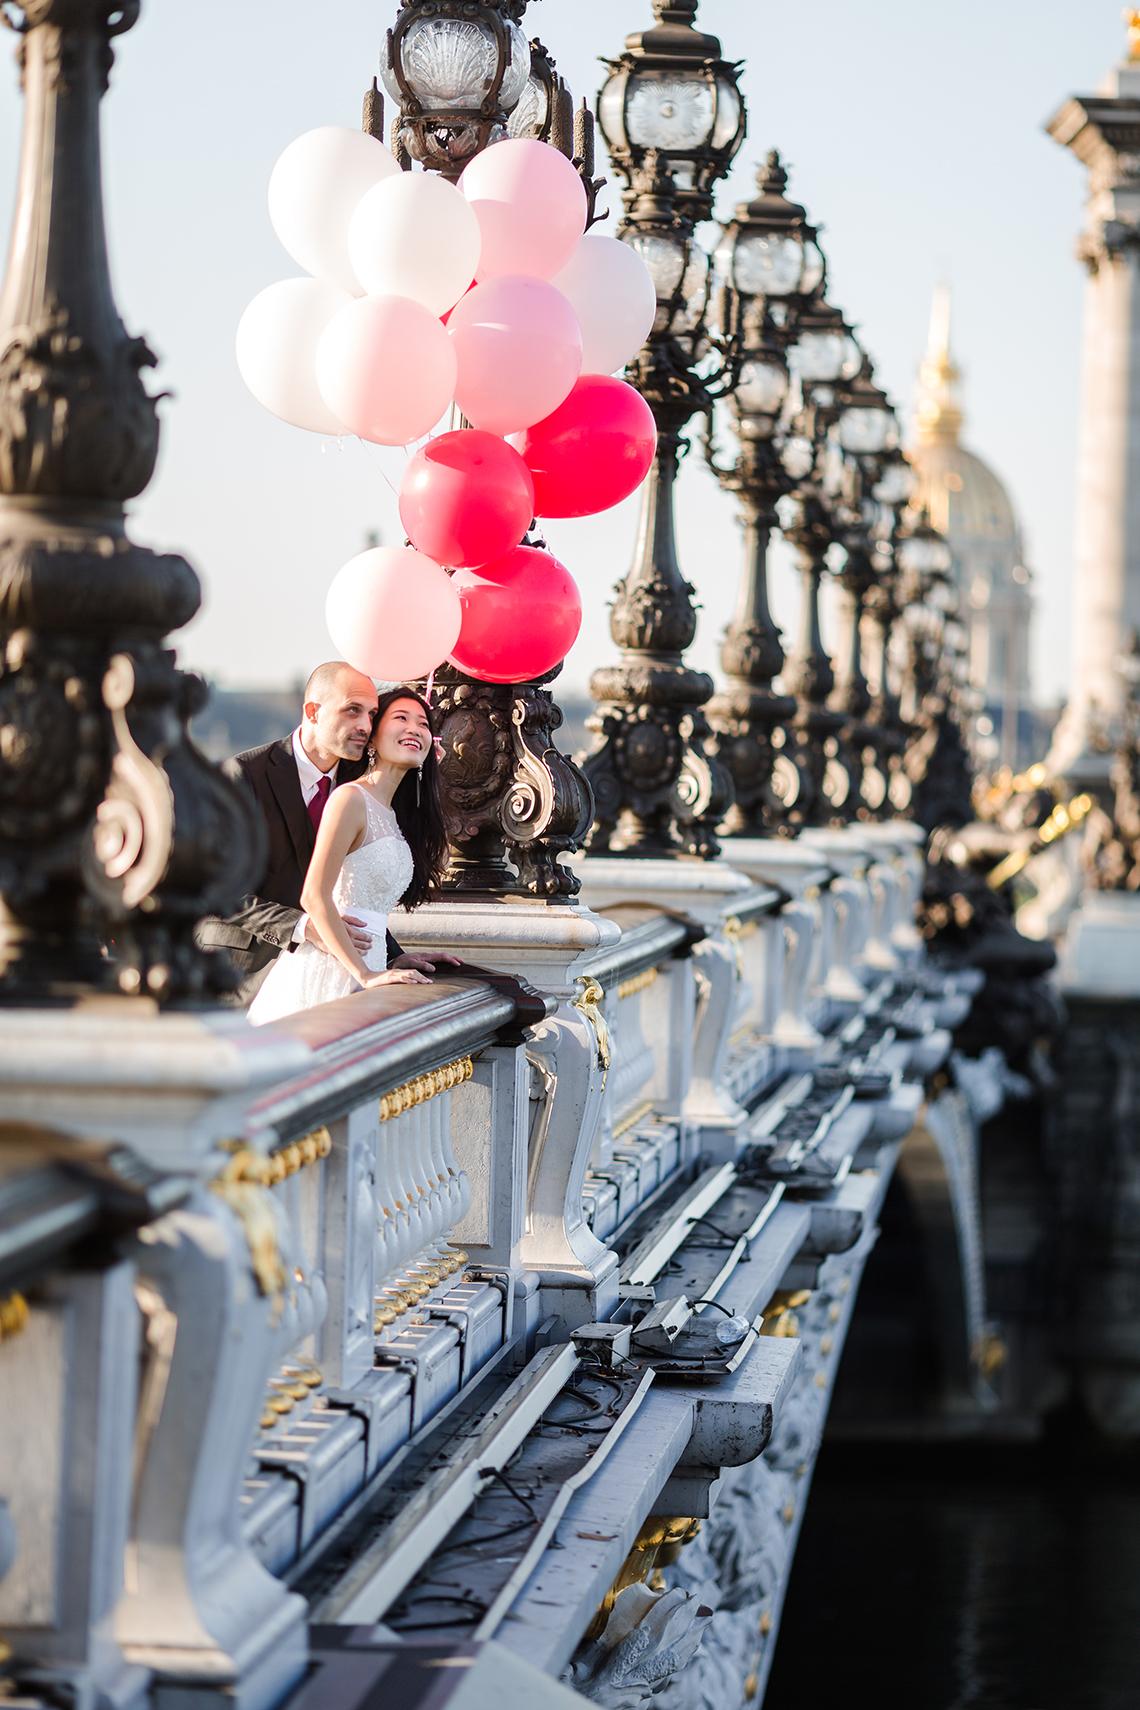 photographe mariage seance engagement paris ballon pont alexandre iii